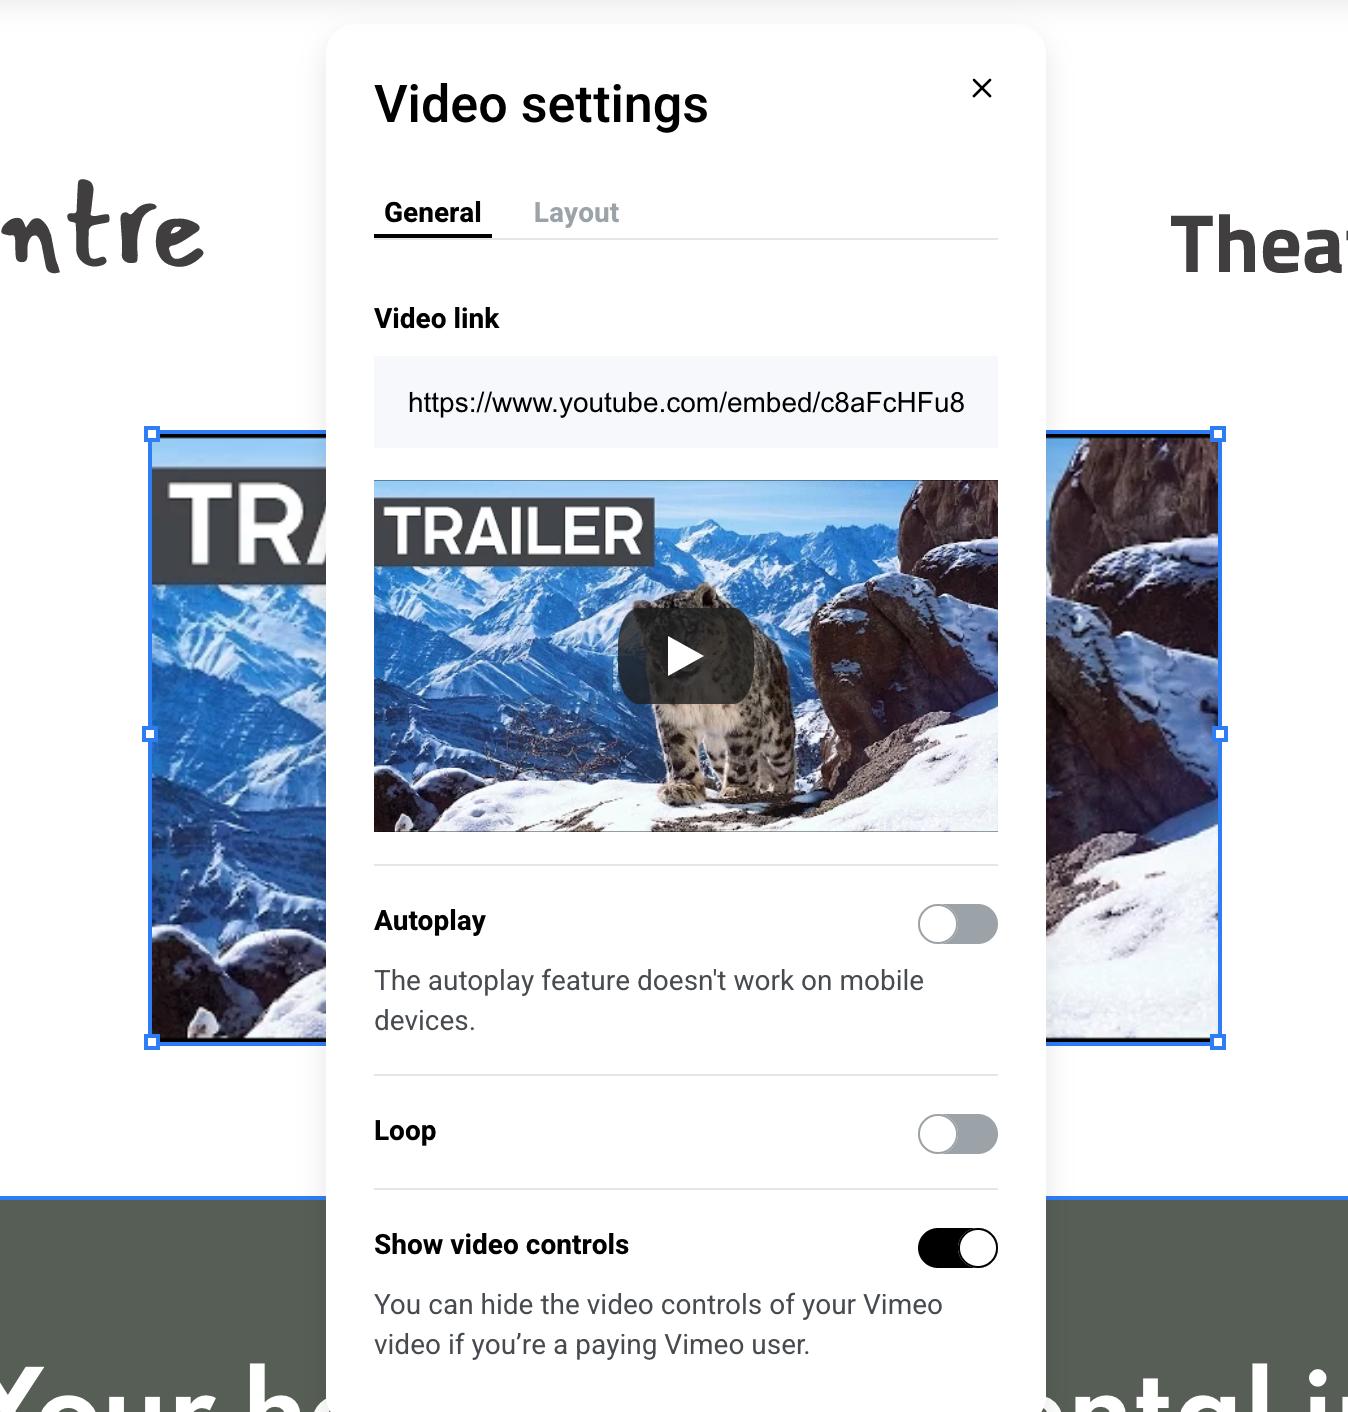 Zyro editor video settings